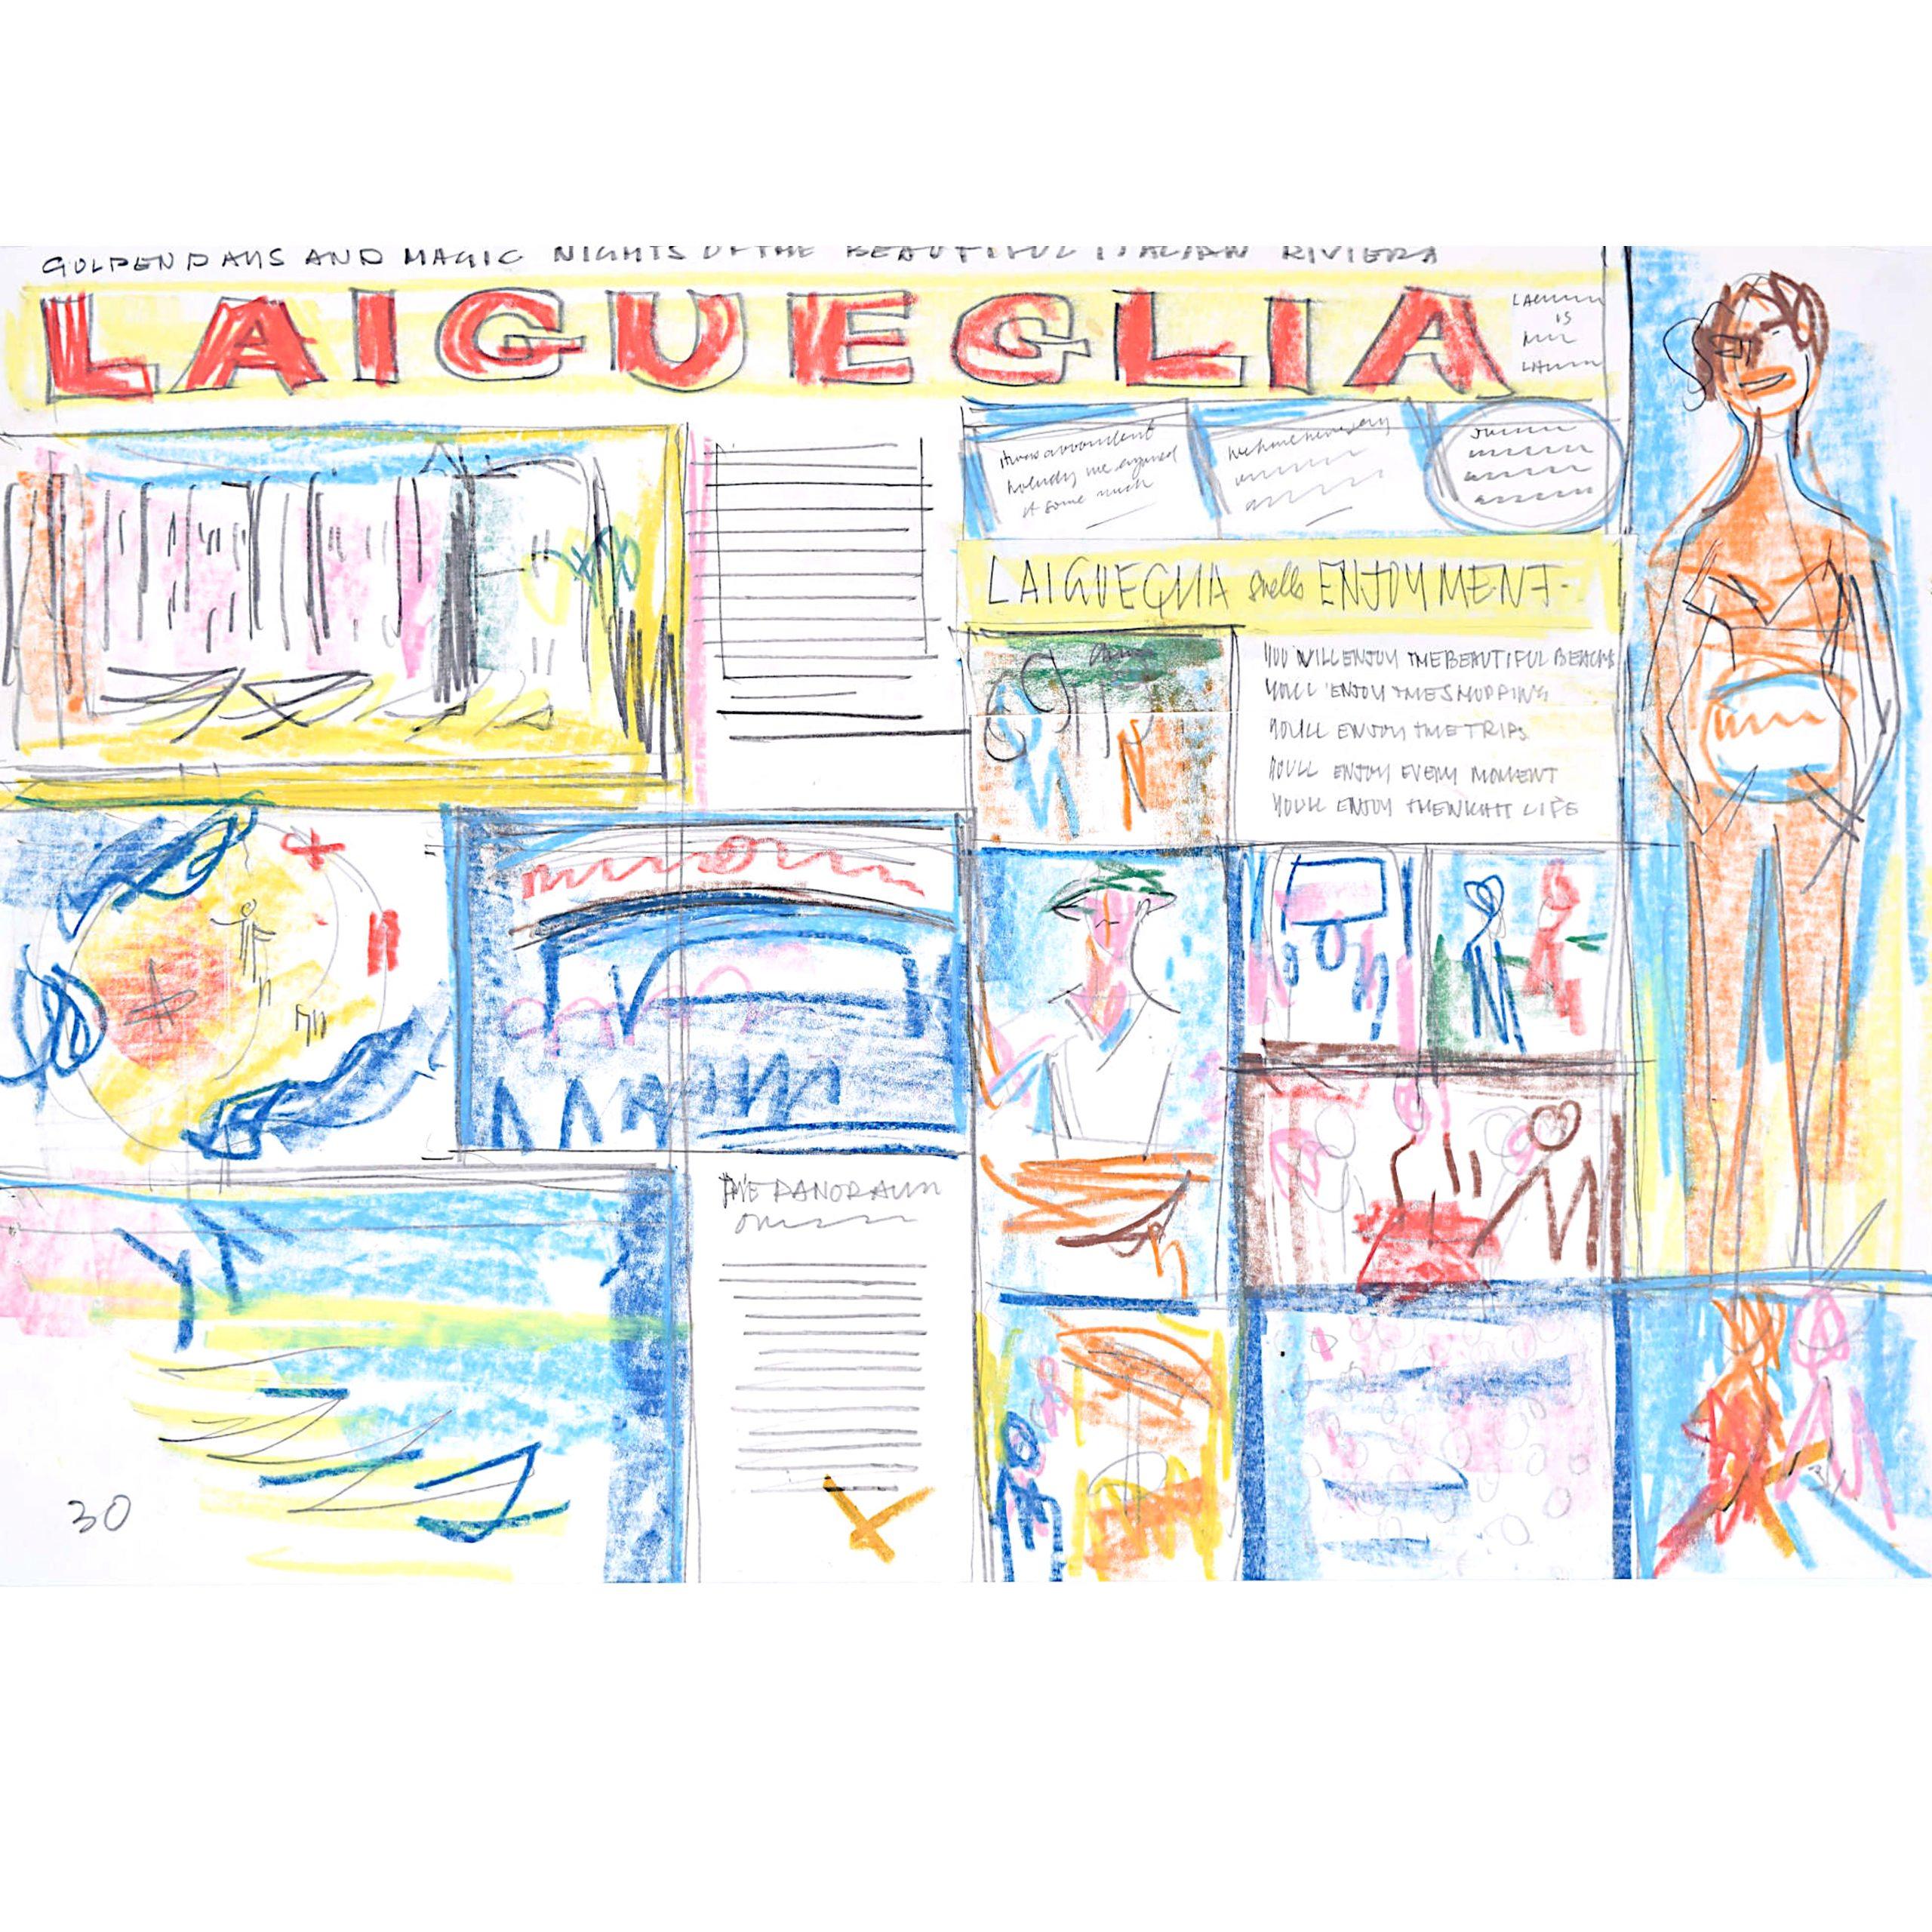 Laigueglia Holiday Brochure Design 3 1966 Peter Collins ARCA Mid Century Modern